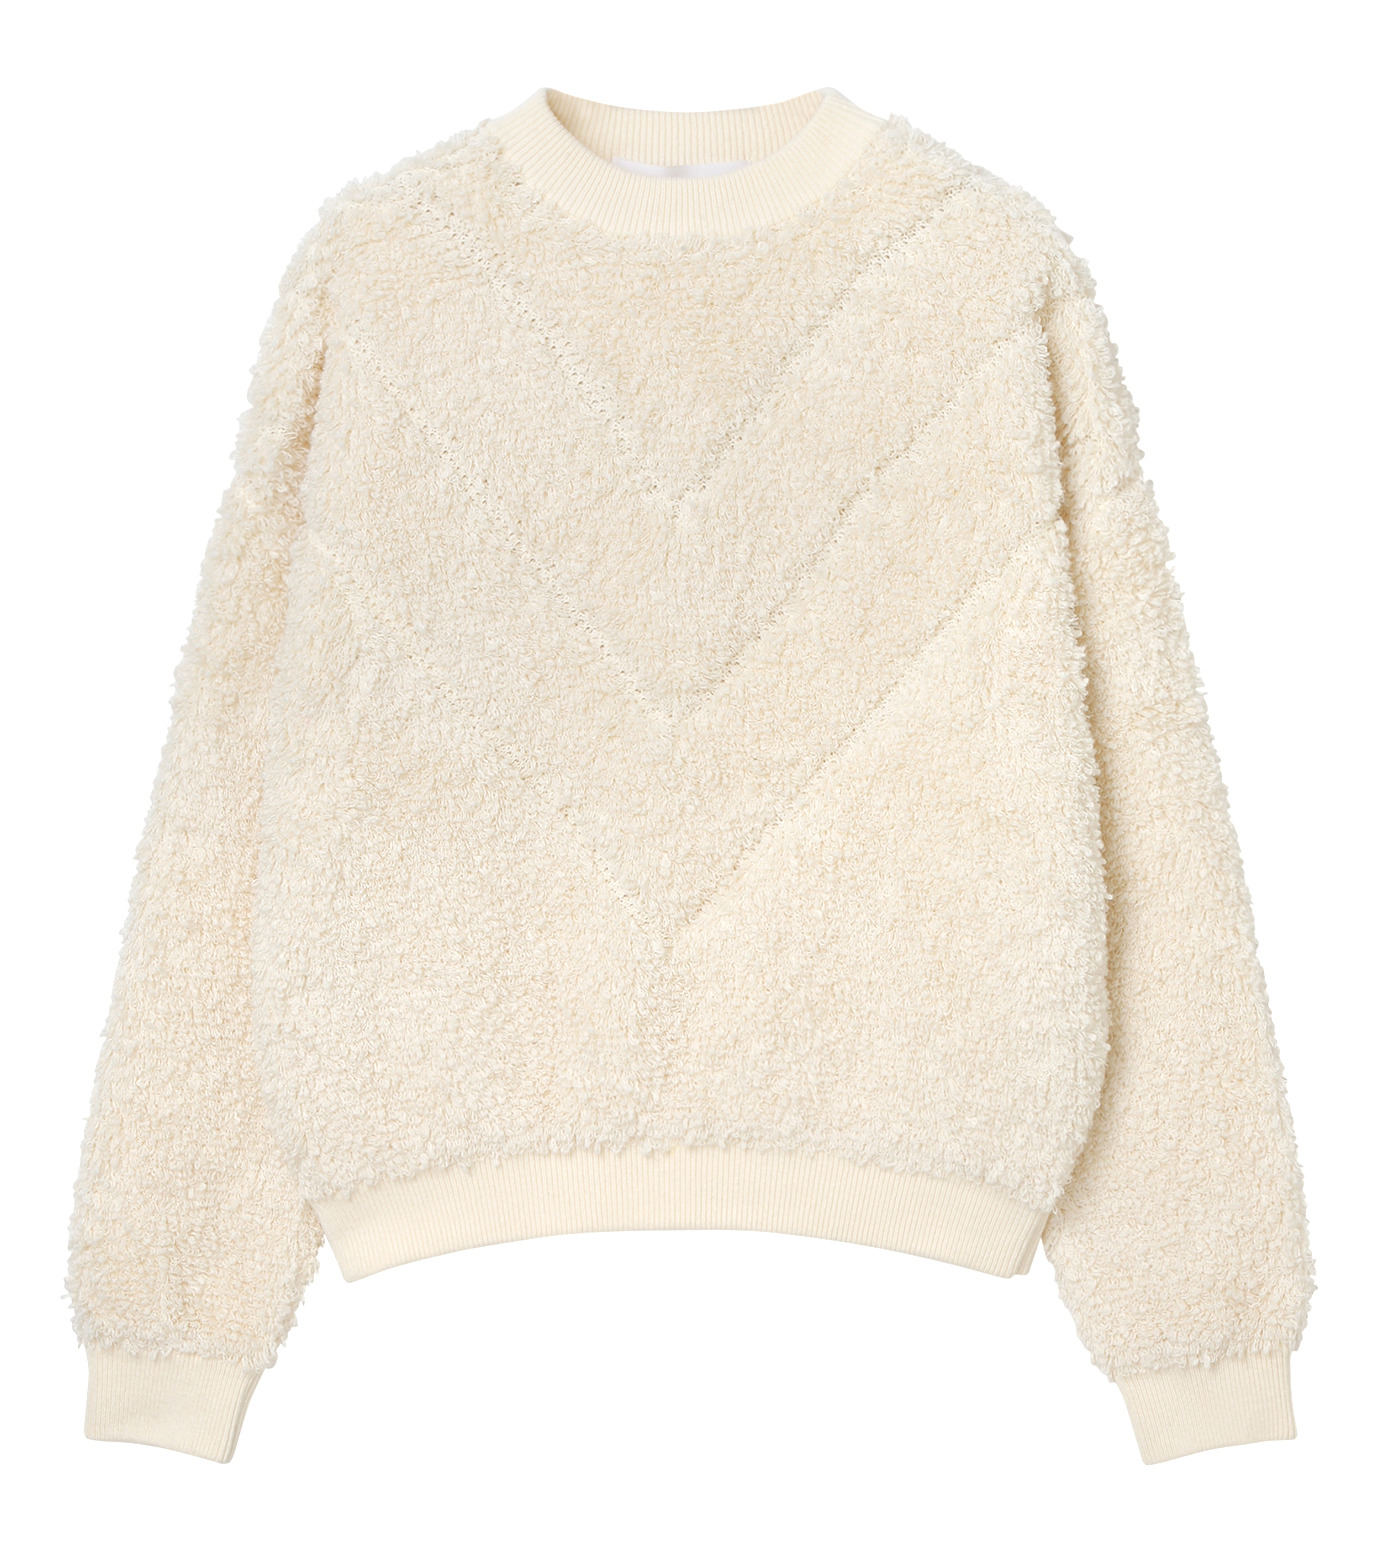 LE CIEL BLEU(ルシェルブルー)のパイルスウェットニットトップス-WHITE(ニット/knit)-18S61010 拡大詳細画像5